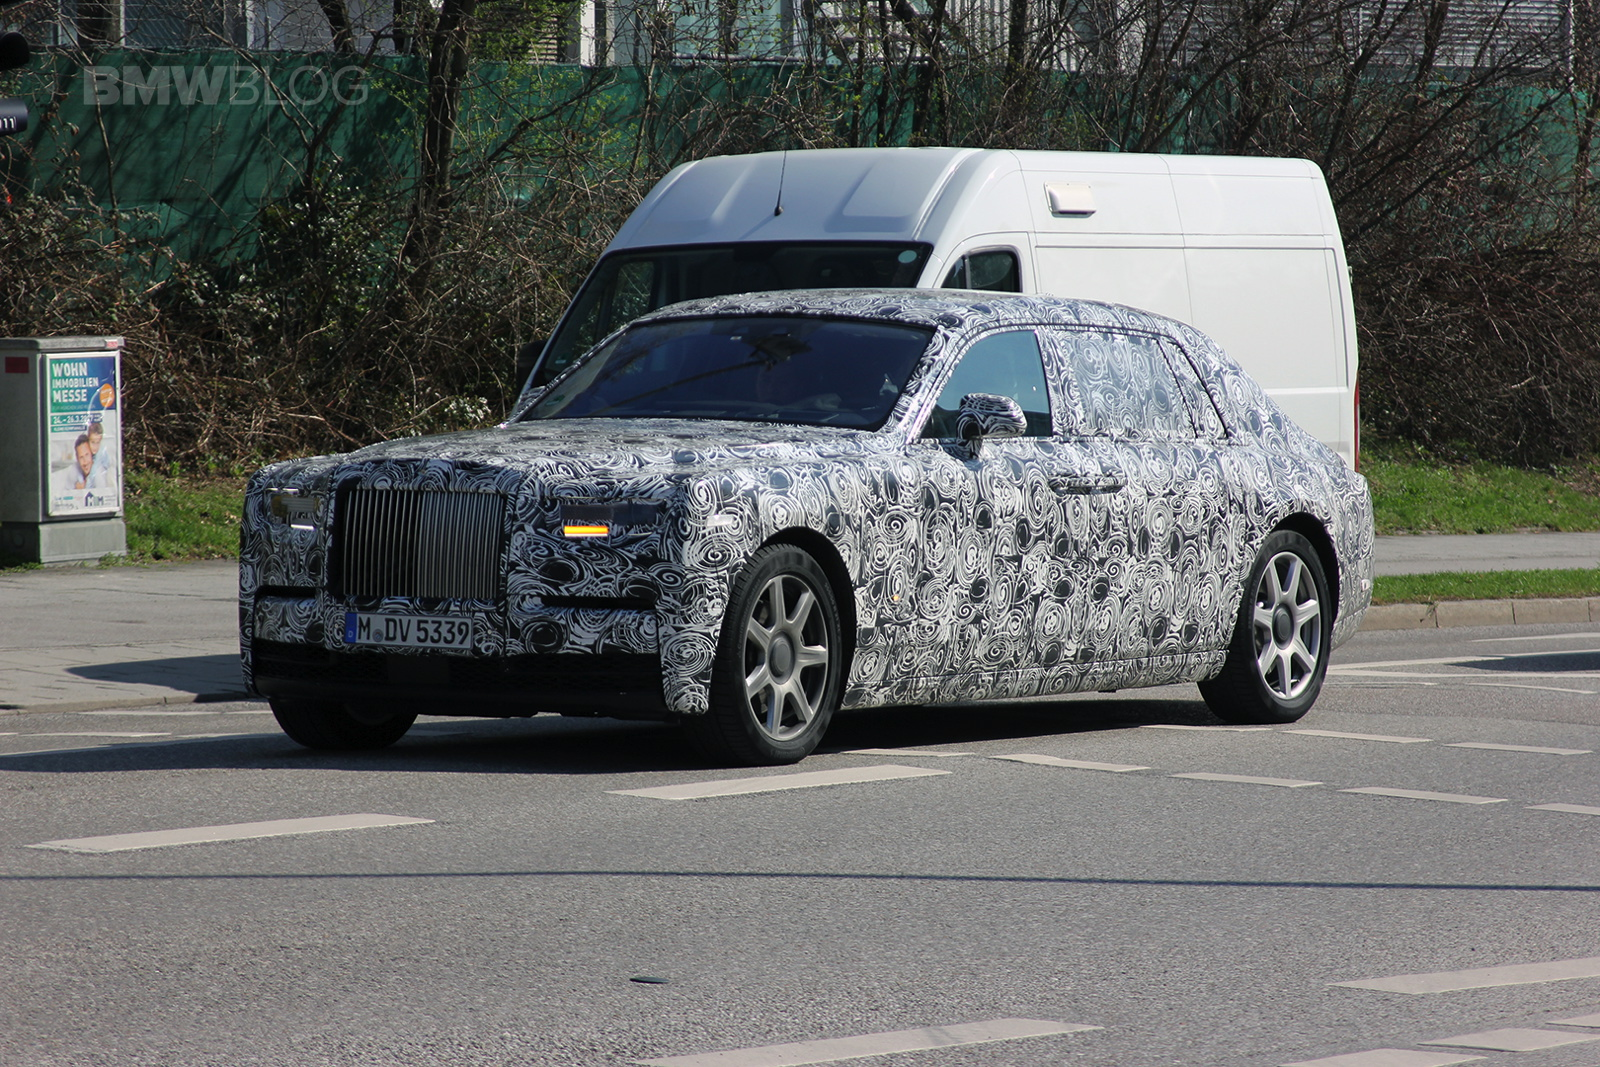 2018 Rolls Royce Phantom Spied 02 750x500